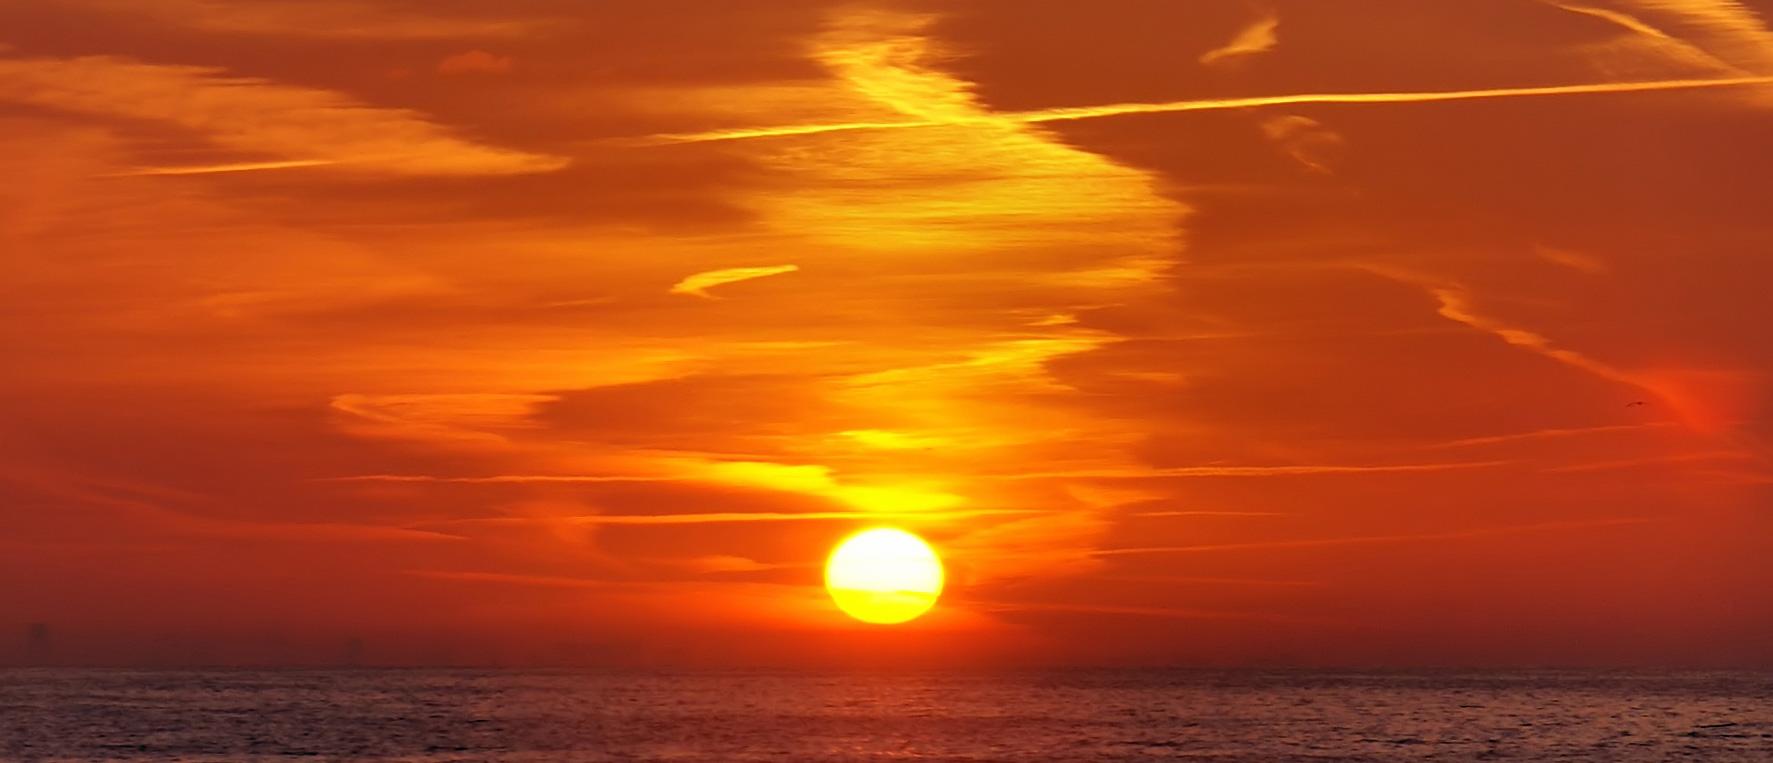 https://upload.wikimedia.org/wikipedia/commons/2/2e/Dawn_over_Oostende_cloud.jpg